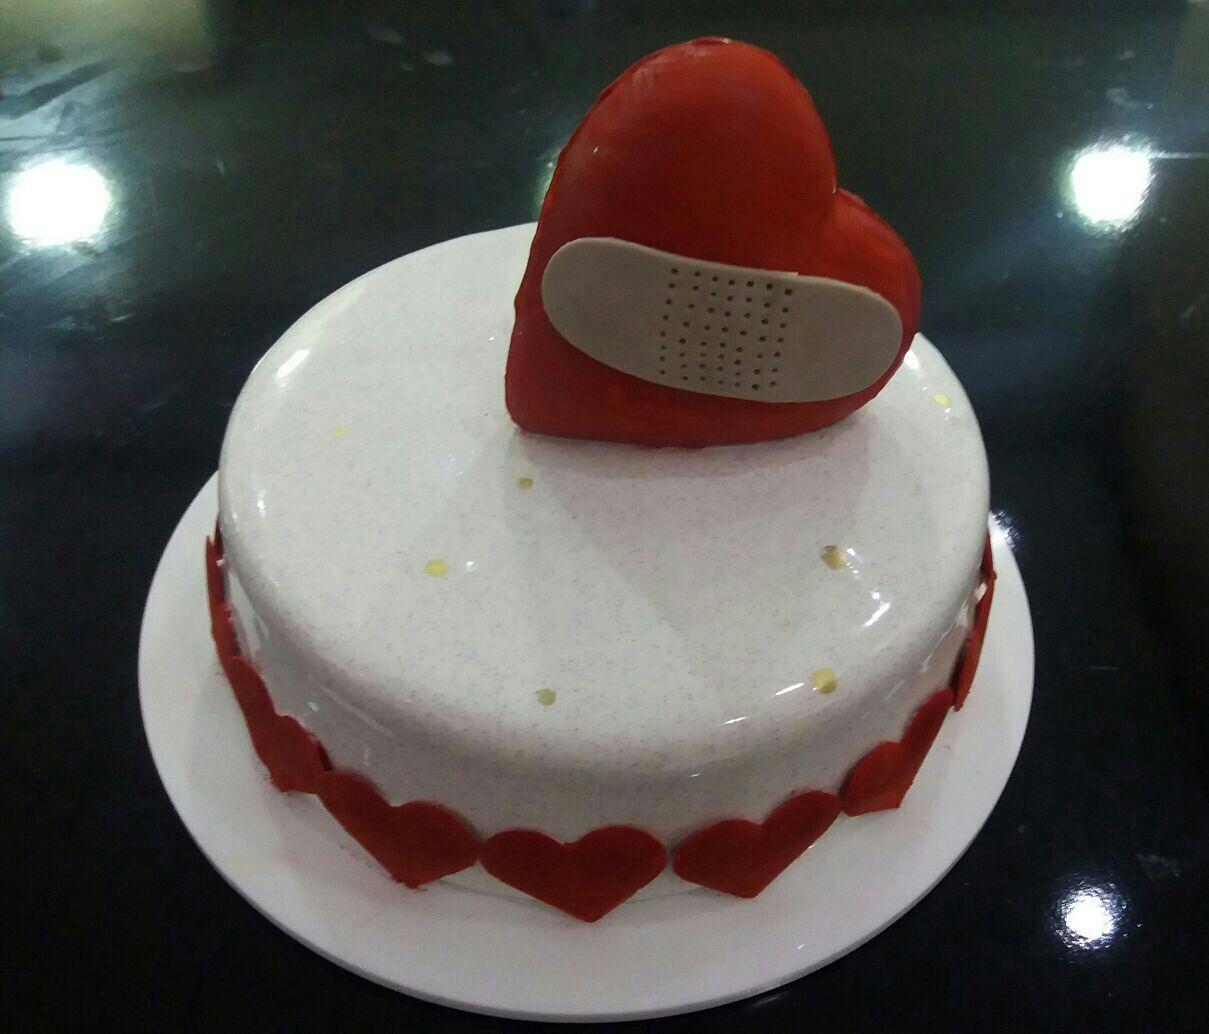 #glaçagem #glaze #coraçao #red #vermelha #heart #sejafoda #branca   #white #feliperochadecorcakee